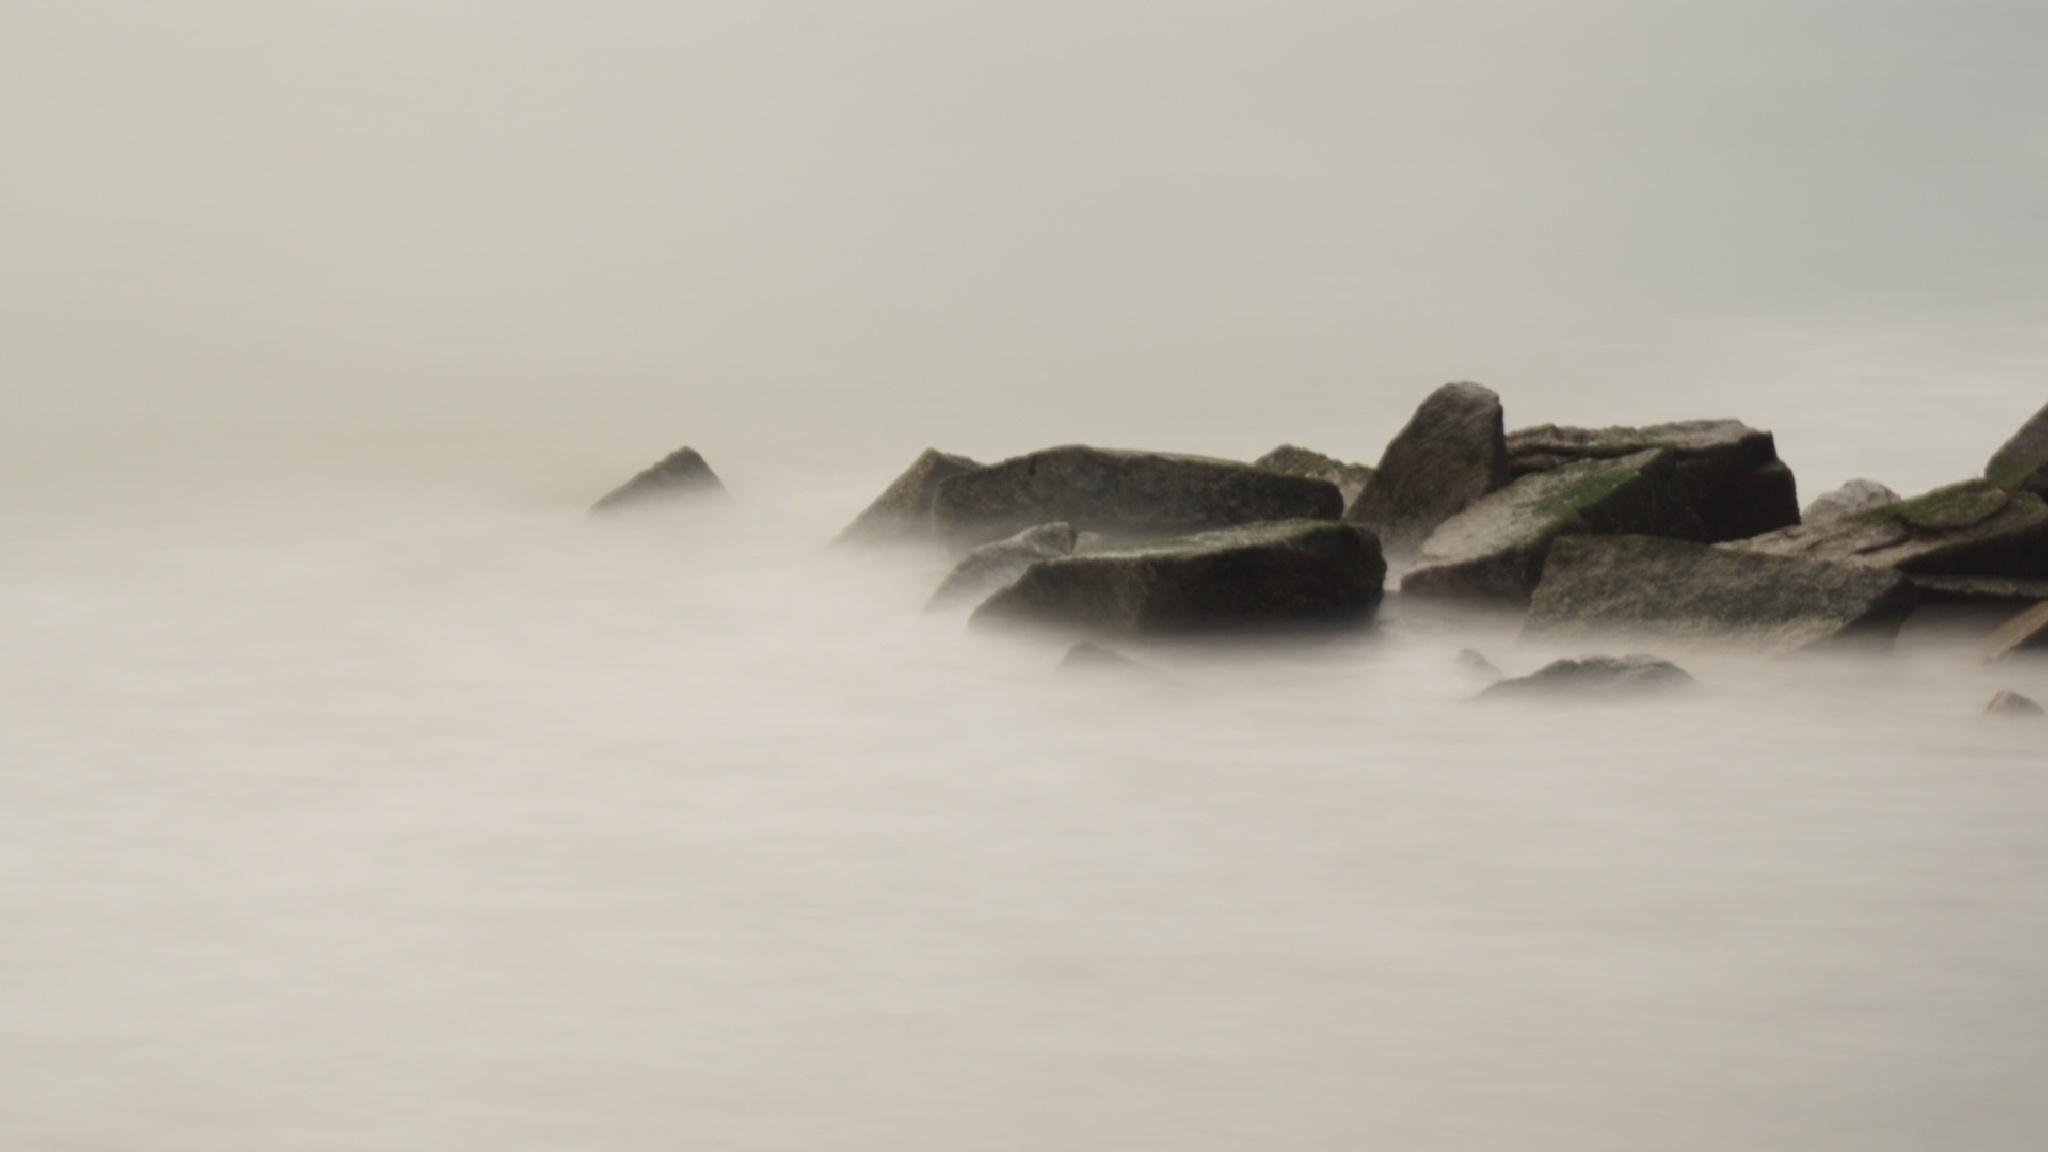 Rocks at Coney Island  Beach by Msladyborsa